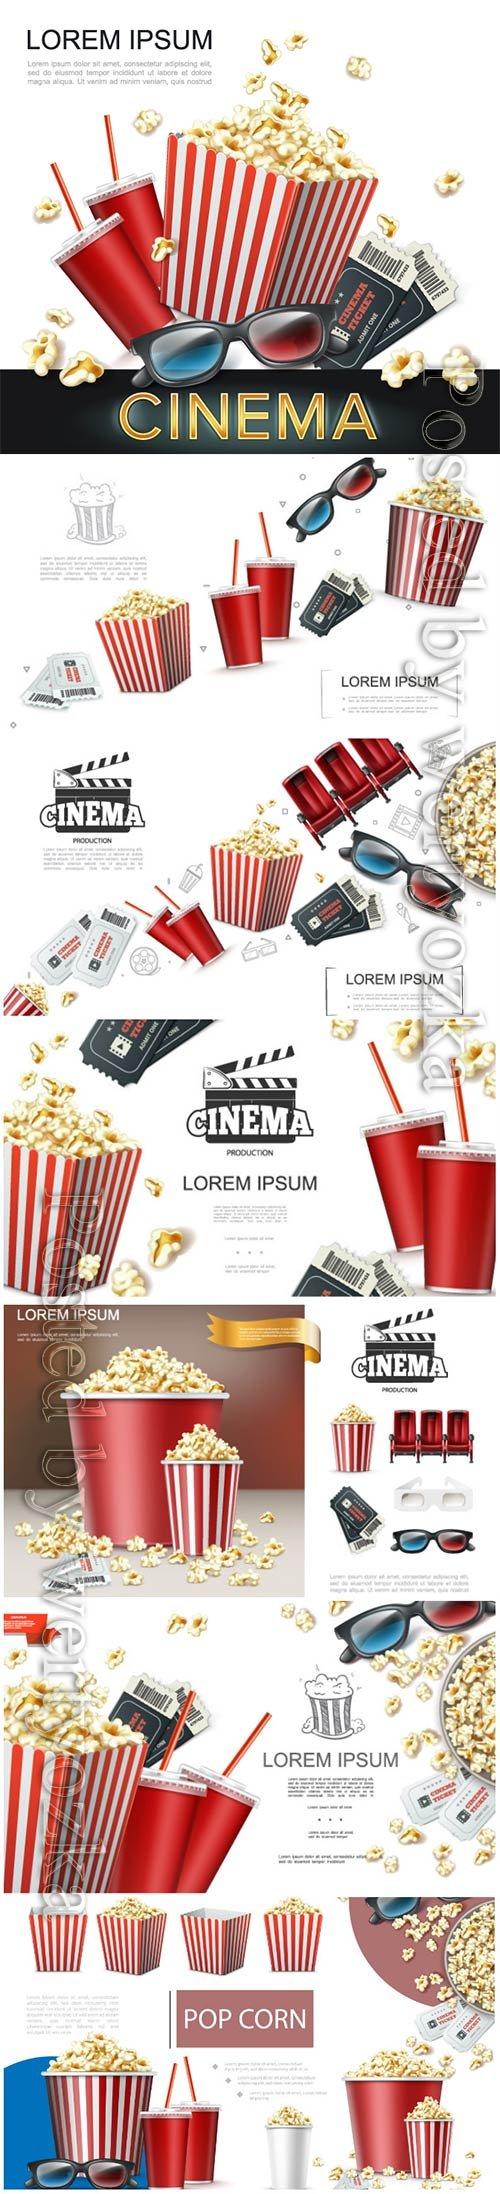 Realistic cinema elements vector background